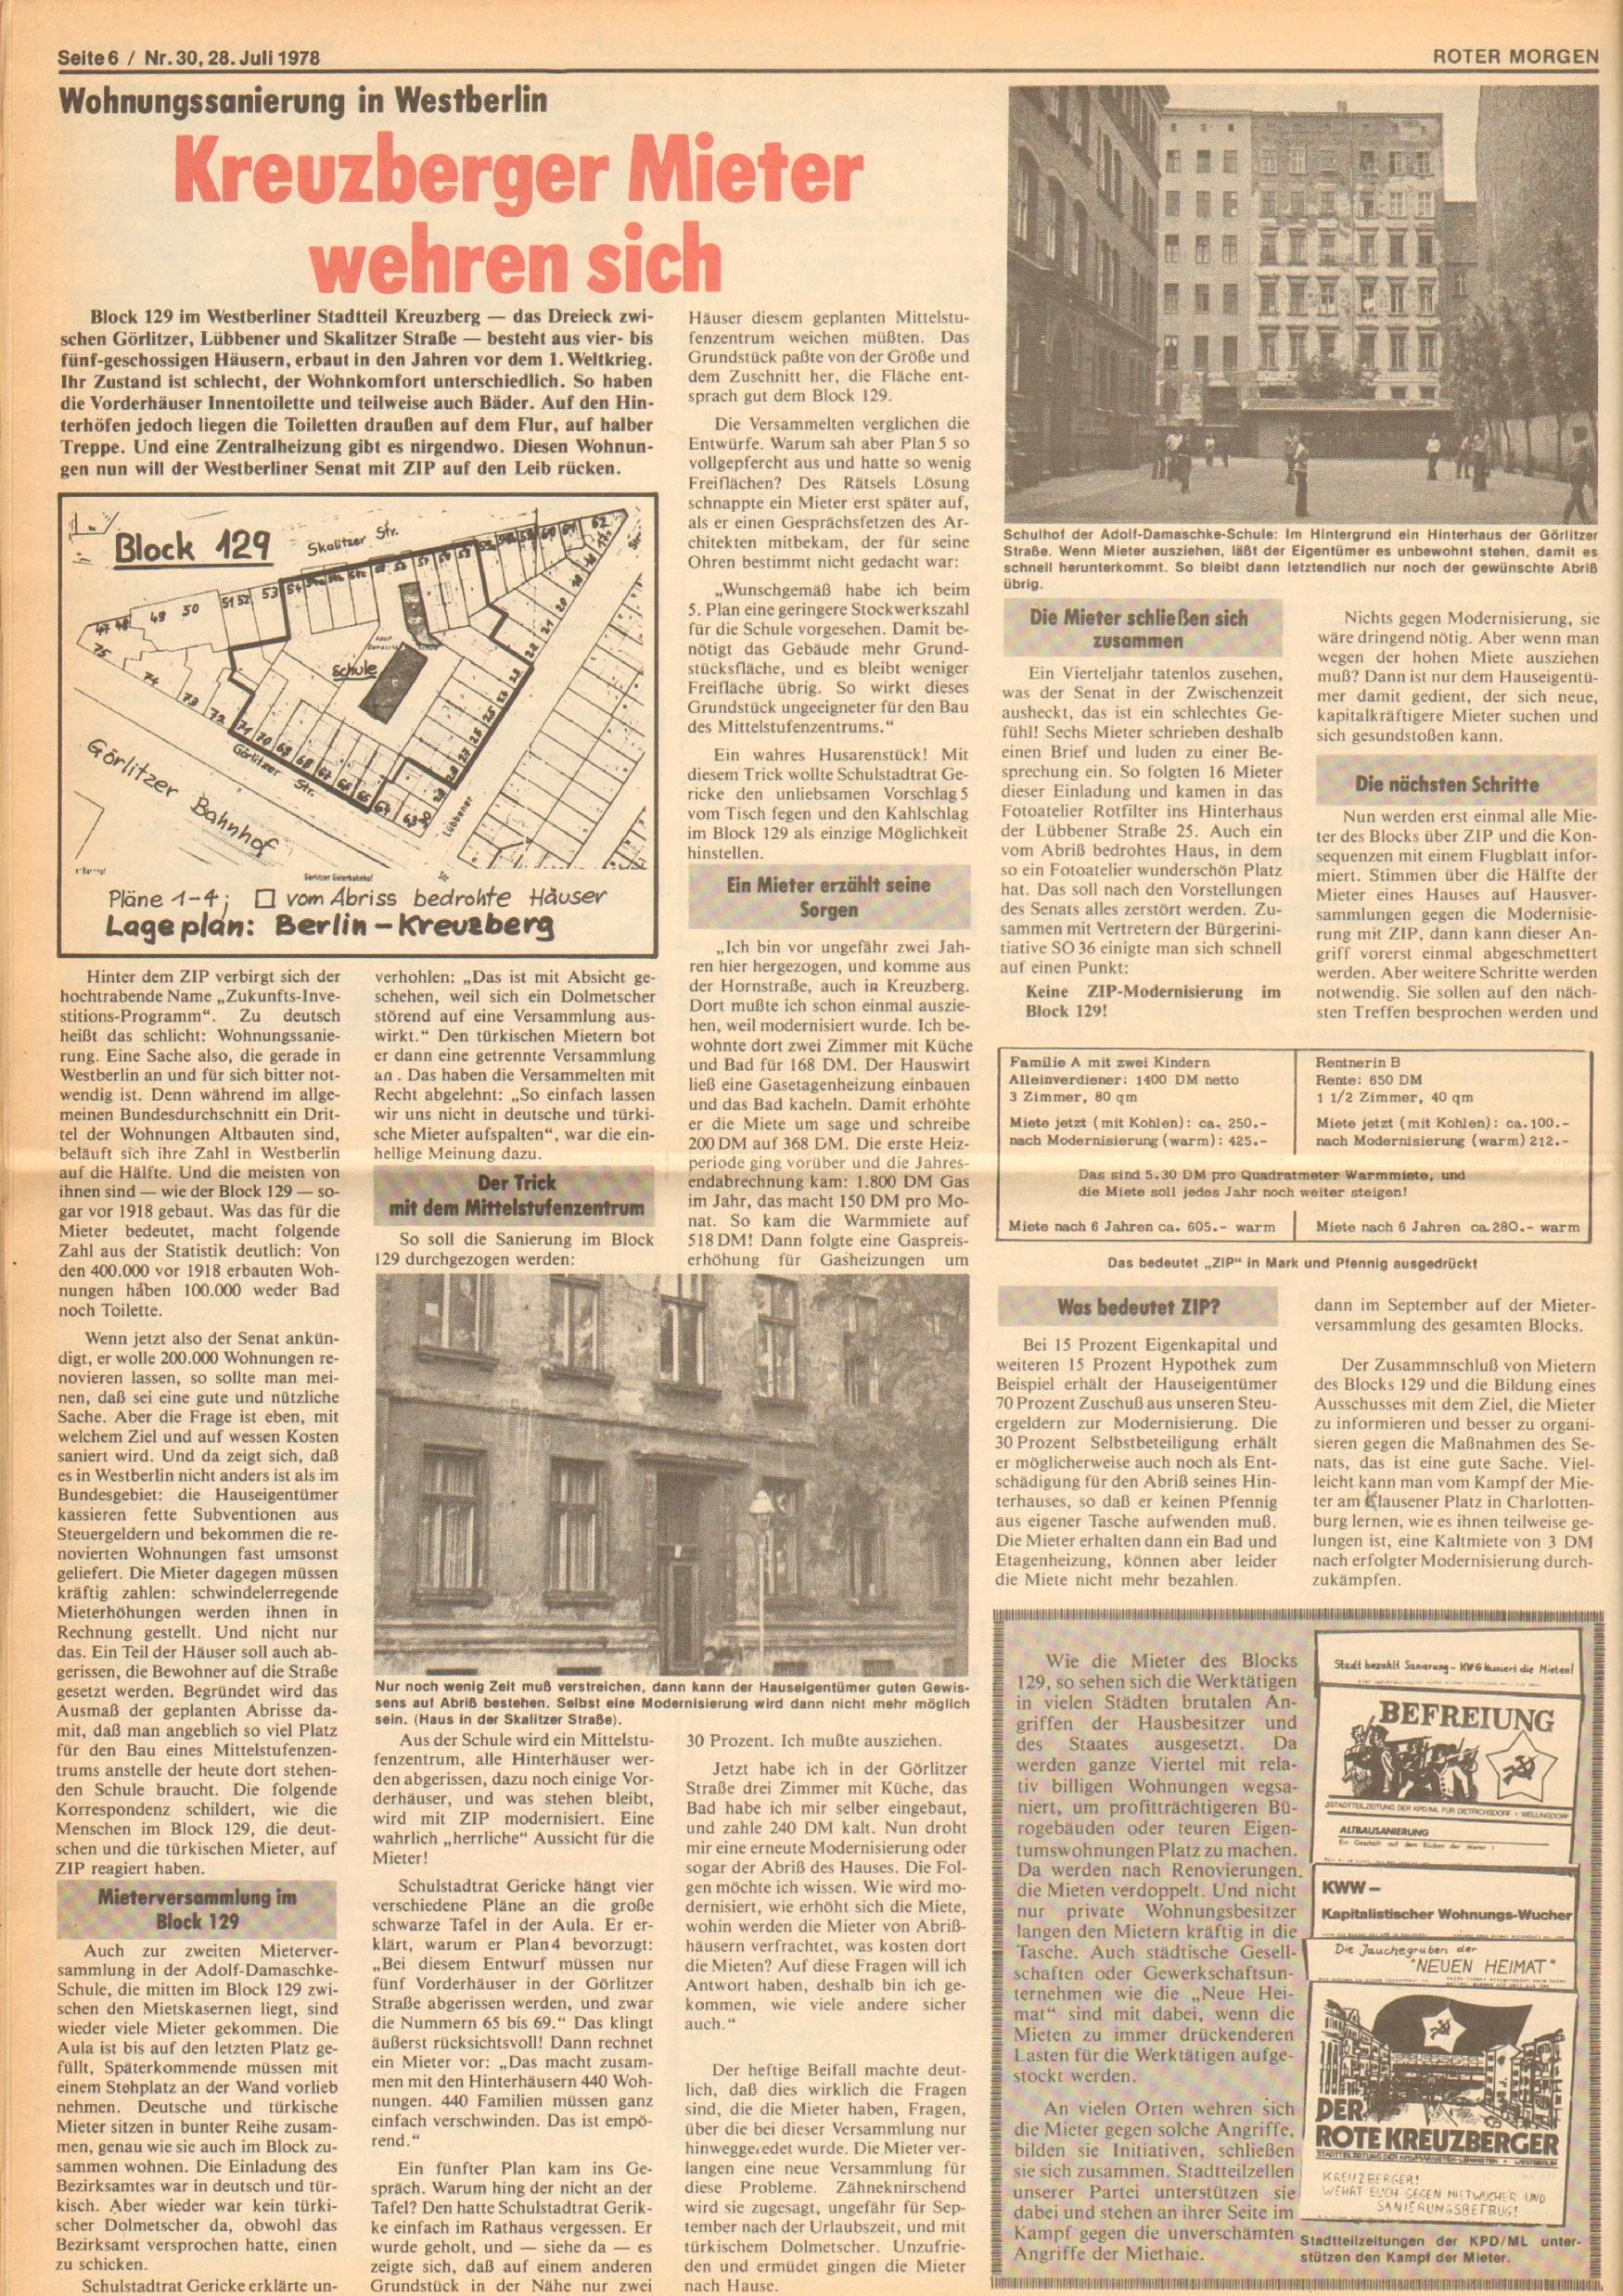 Roter Morgen, 12. Jg., 28. Juli 1978, Nr. 30, Seite 6